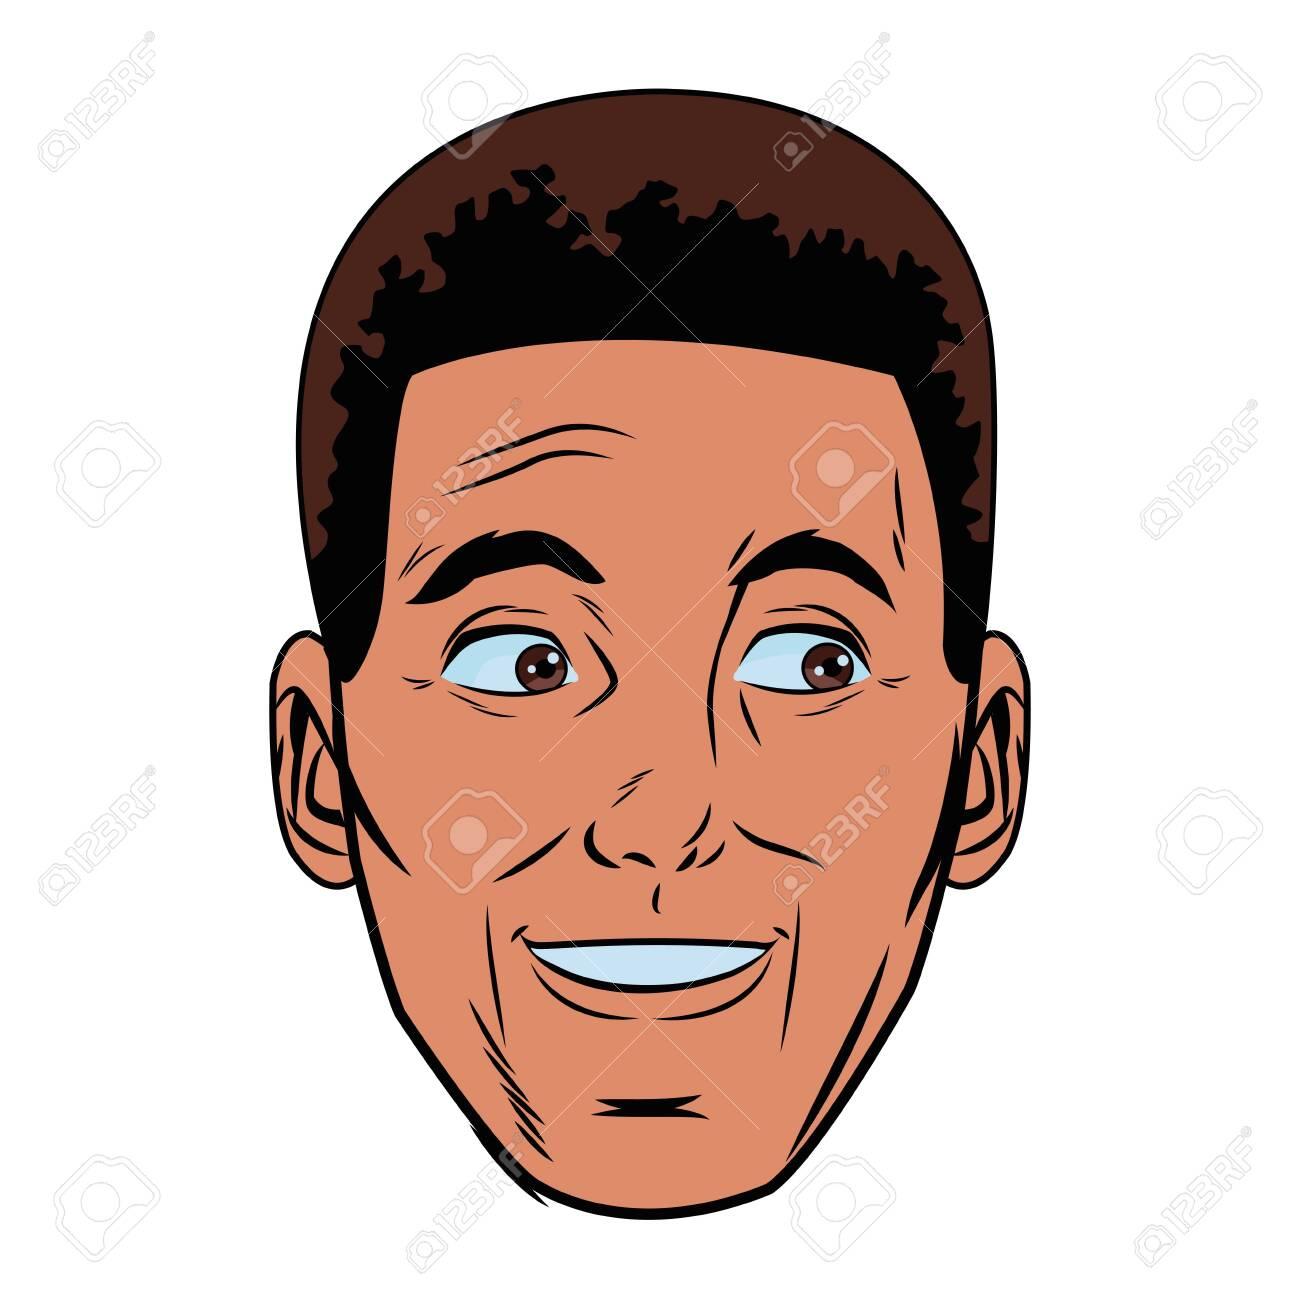 afroamerican man face avatar profile picture cartoon character